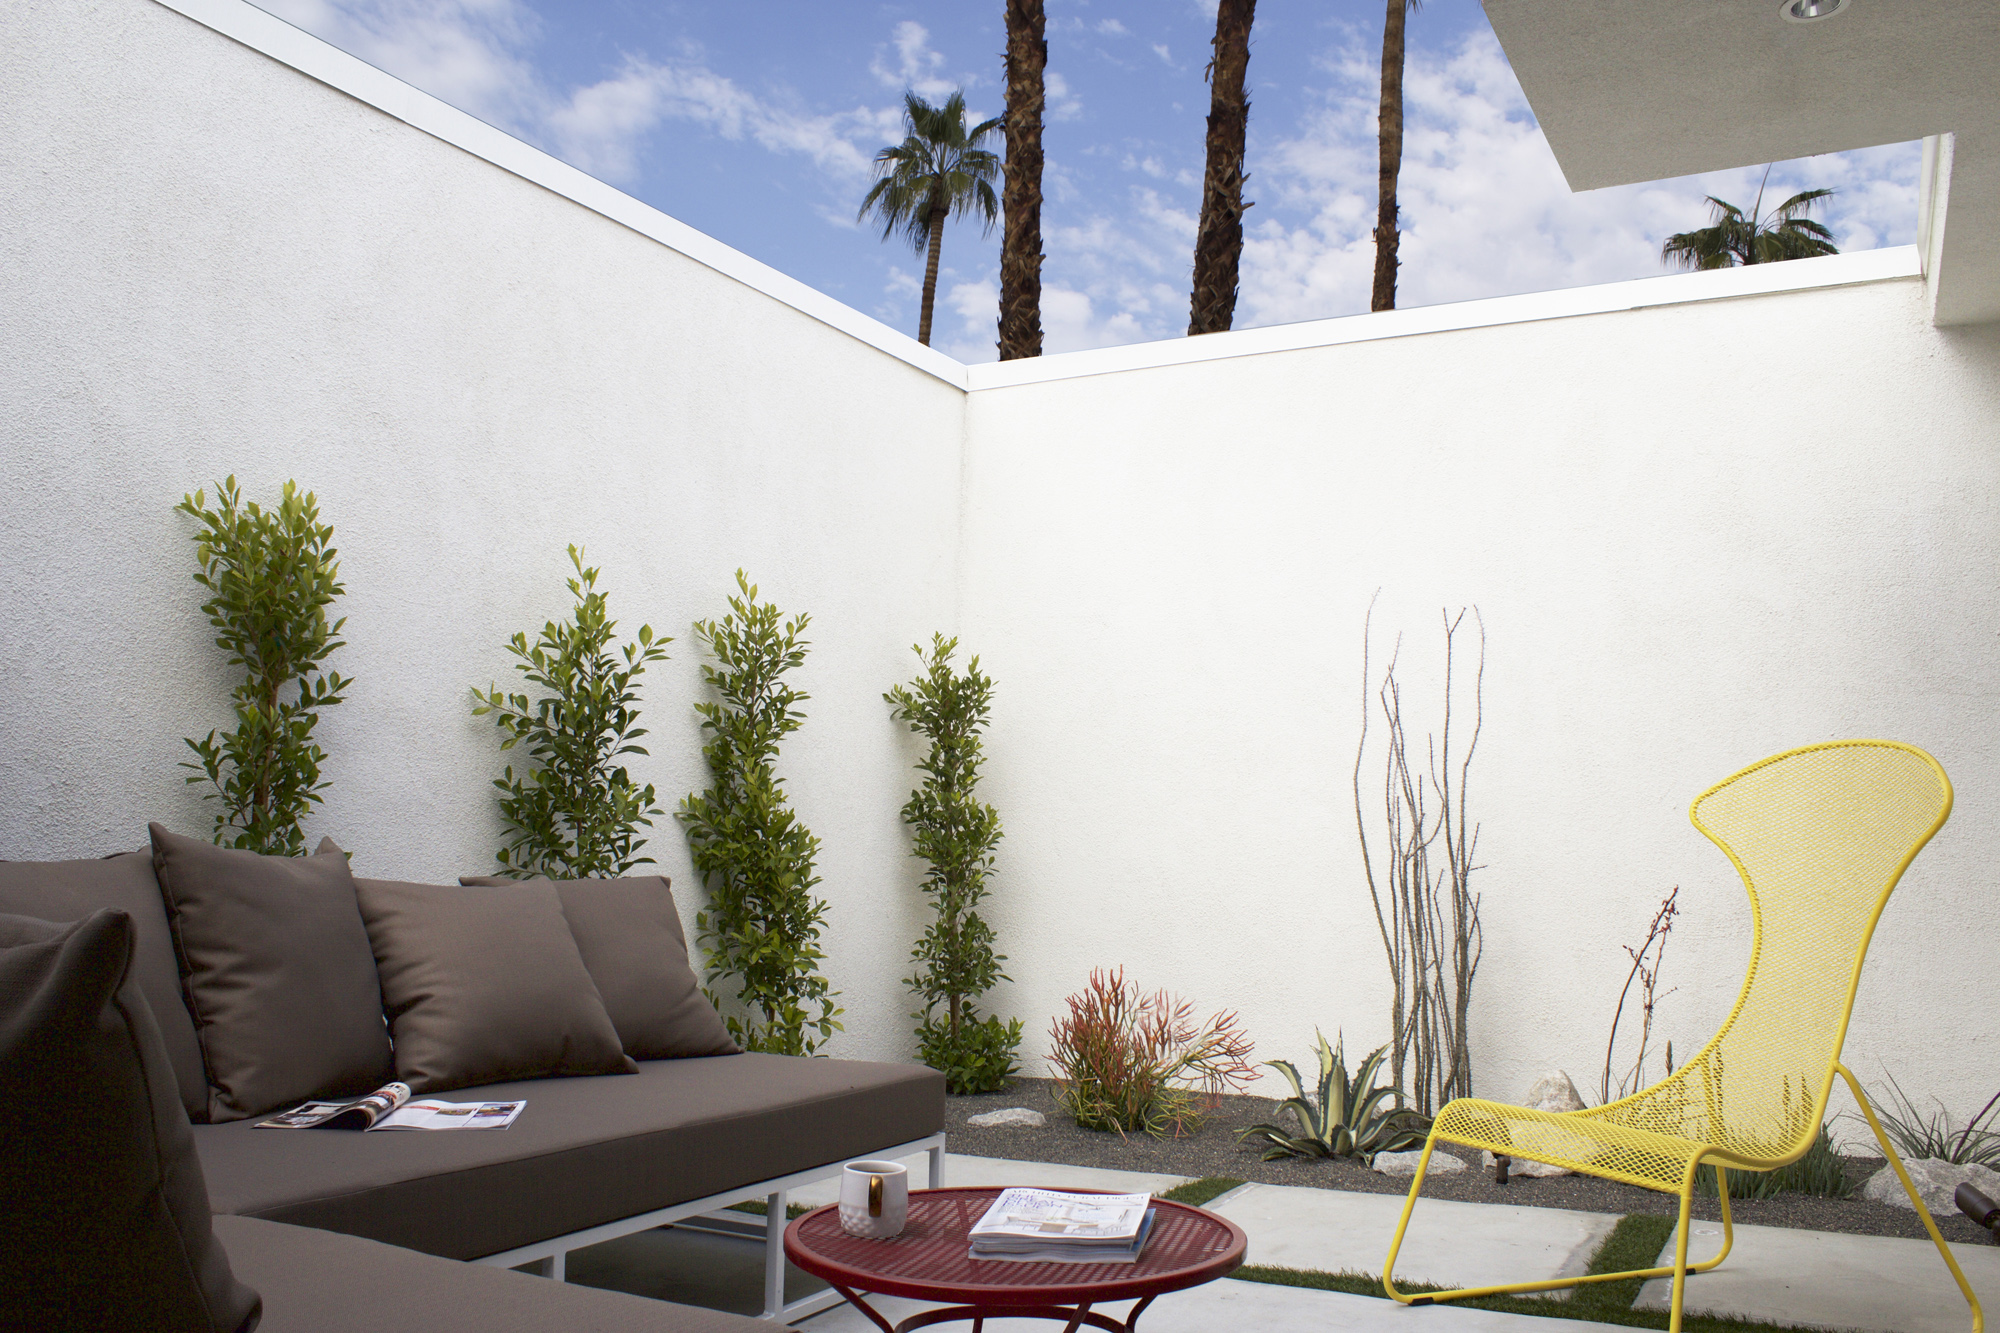 Palm springs firebird bauer clifton interiors juneau for Palm springs interior design style